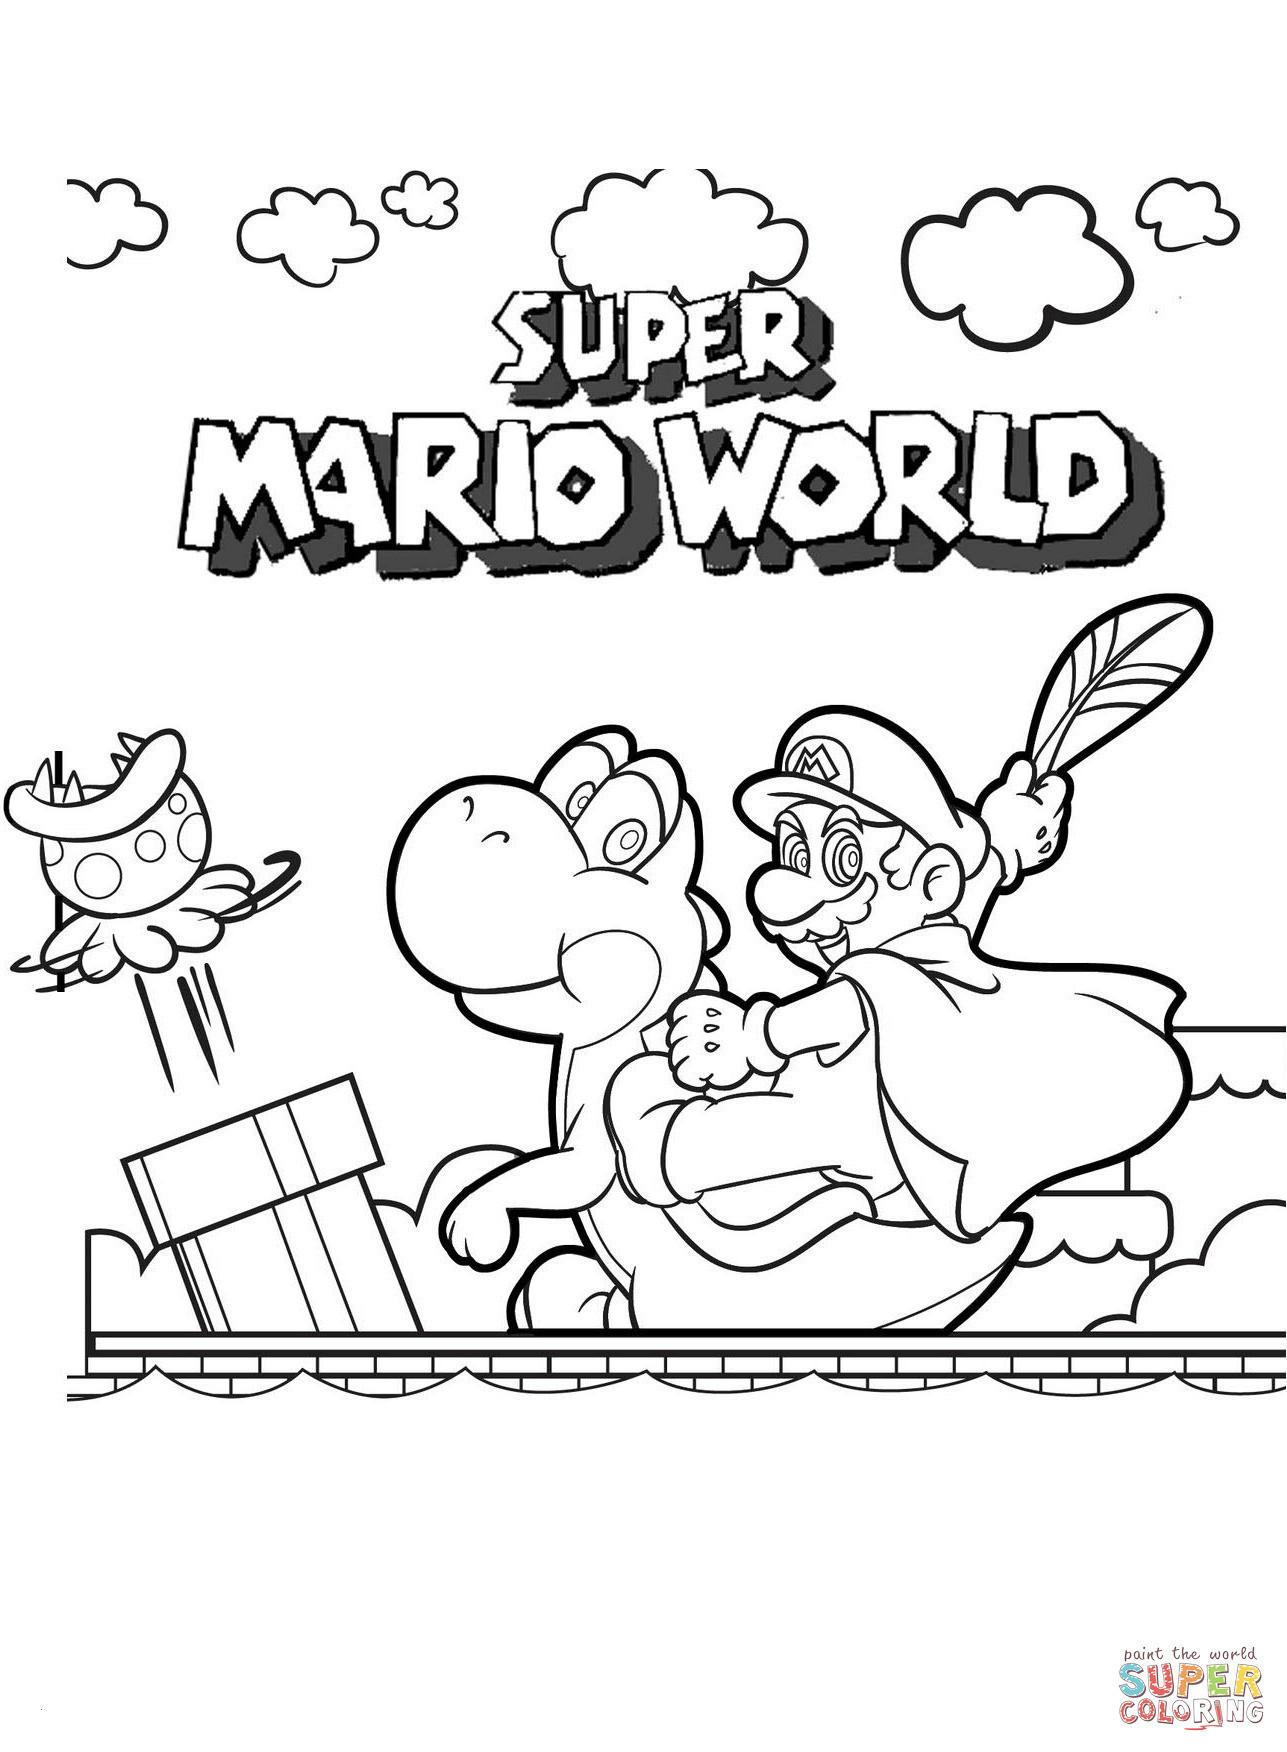 Ausmalbilder Mario Kart Neu 28 Elegant Schöne Ausmalbilder Zum Ausdrucken Neu Mario Kart Fotos